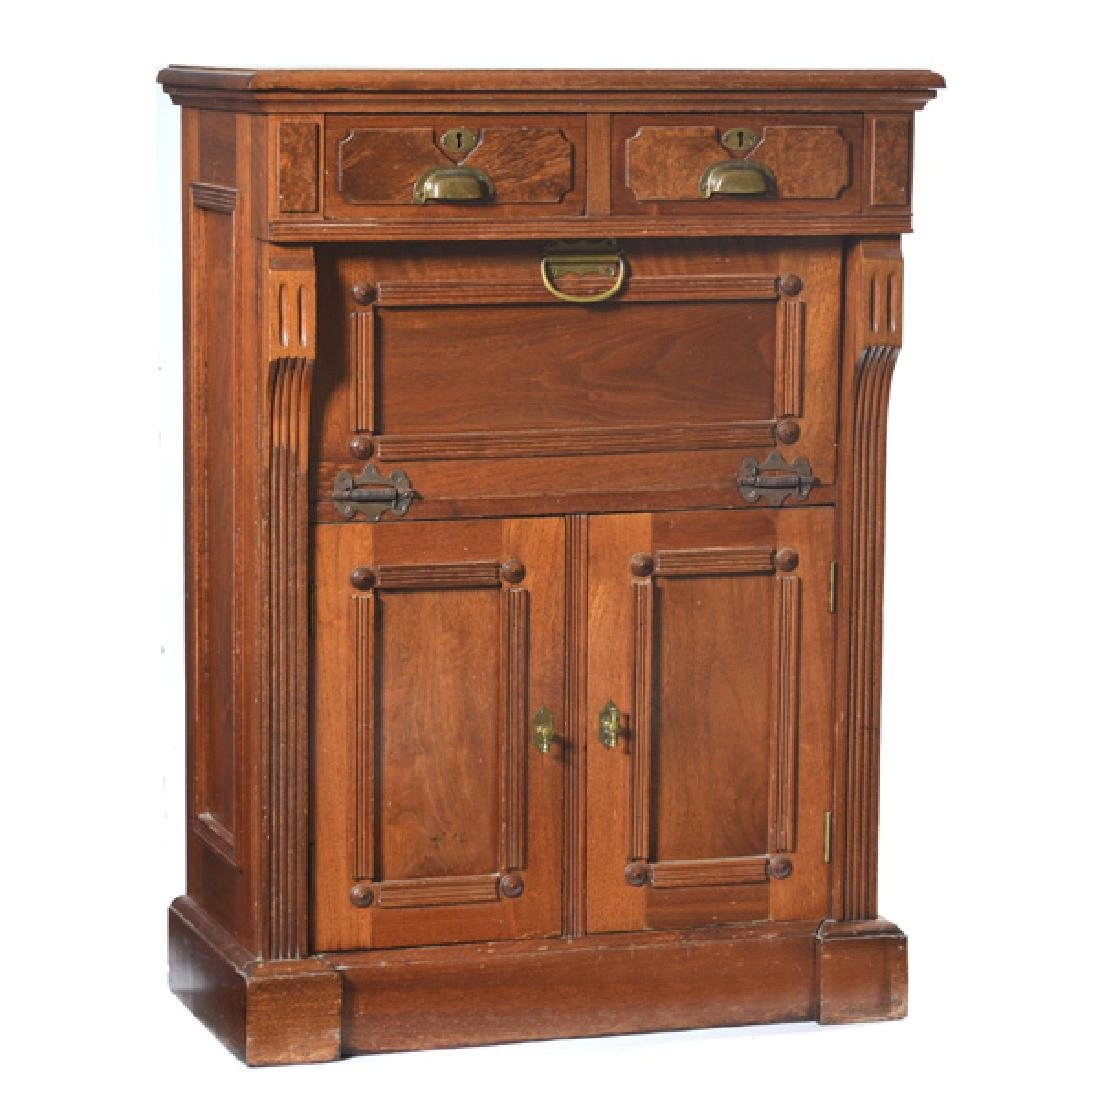 Rare Victorian American Walnut Barbershop Cabinet